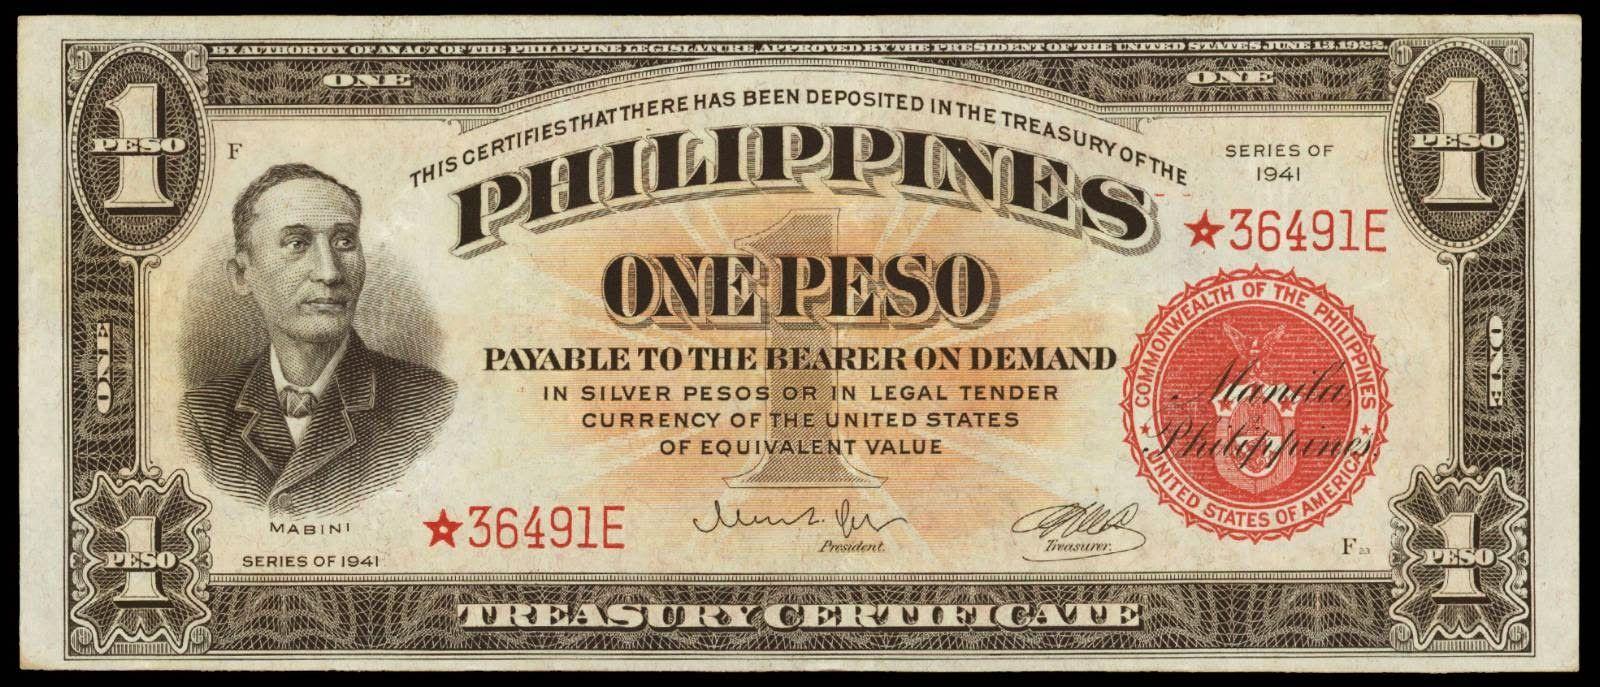 One Peso Treasury Certificate 1941